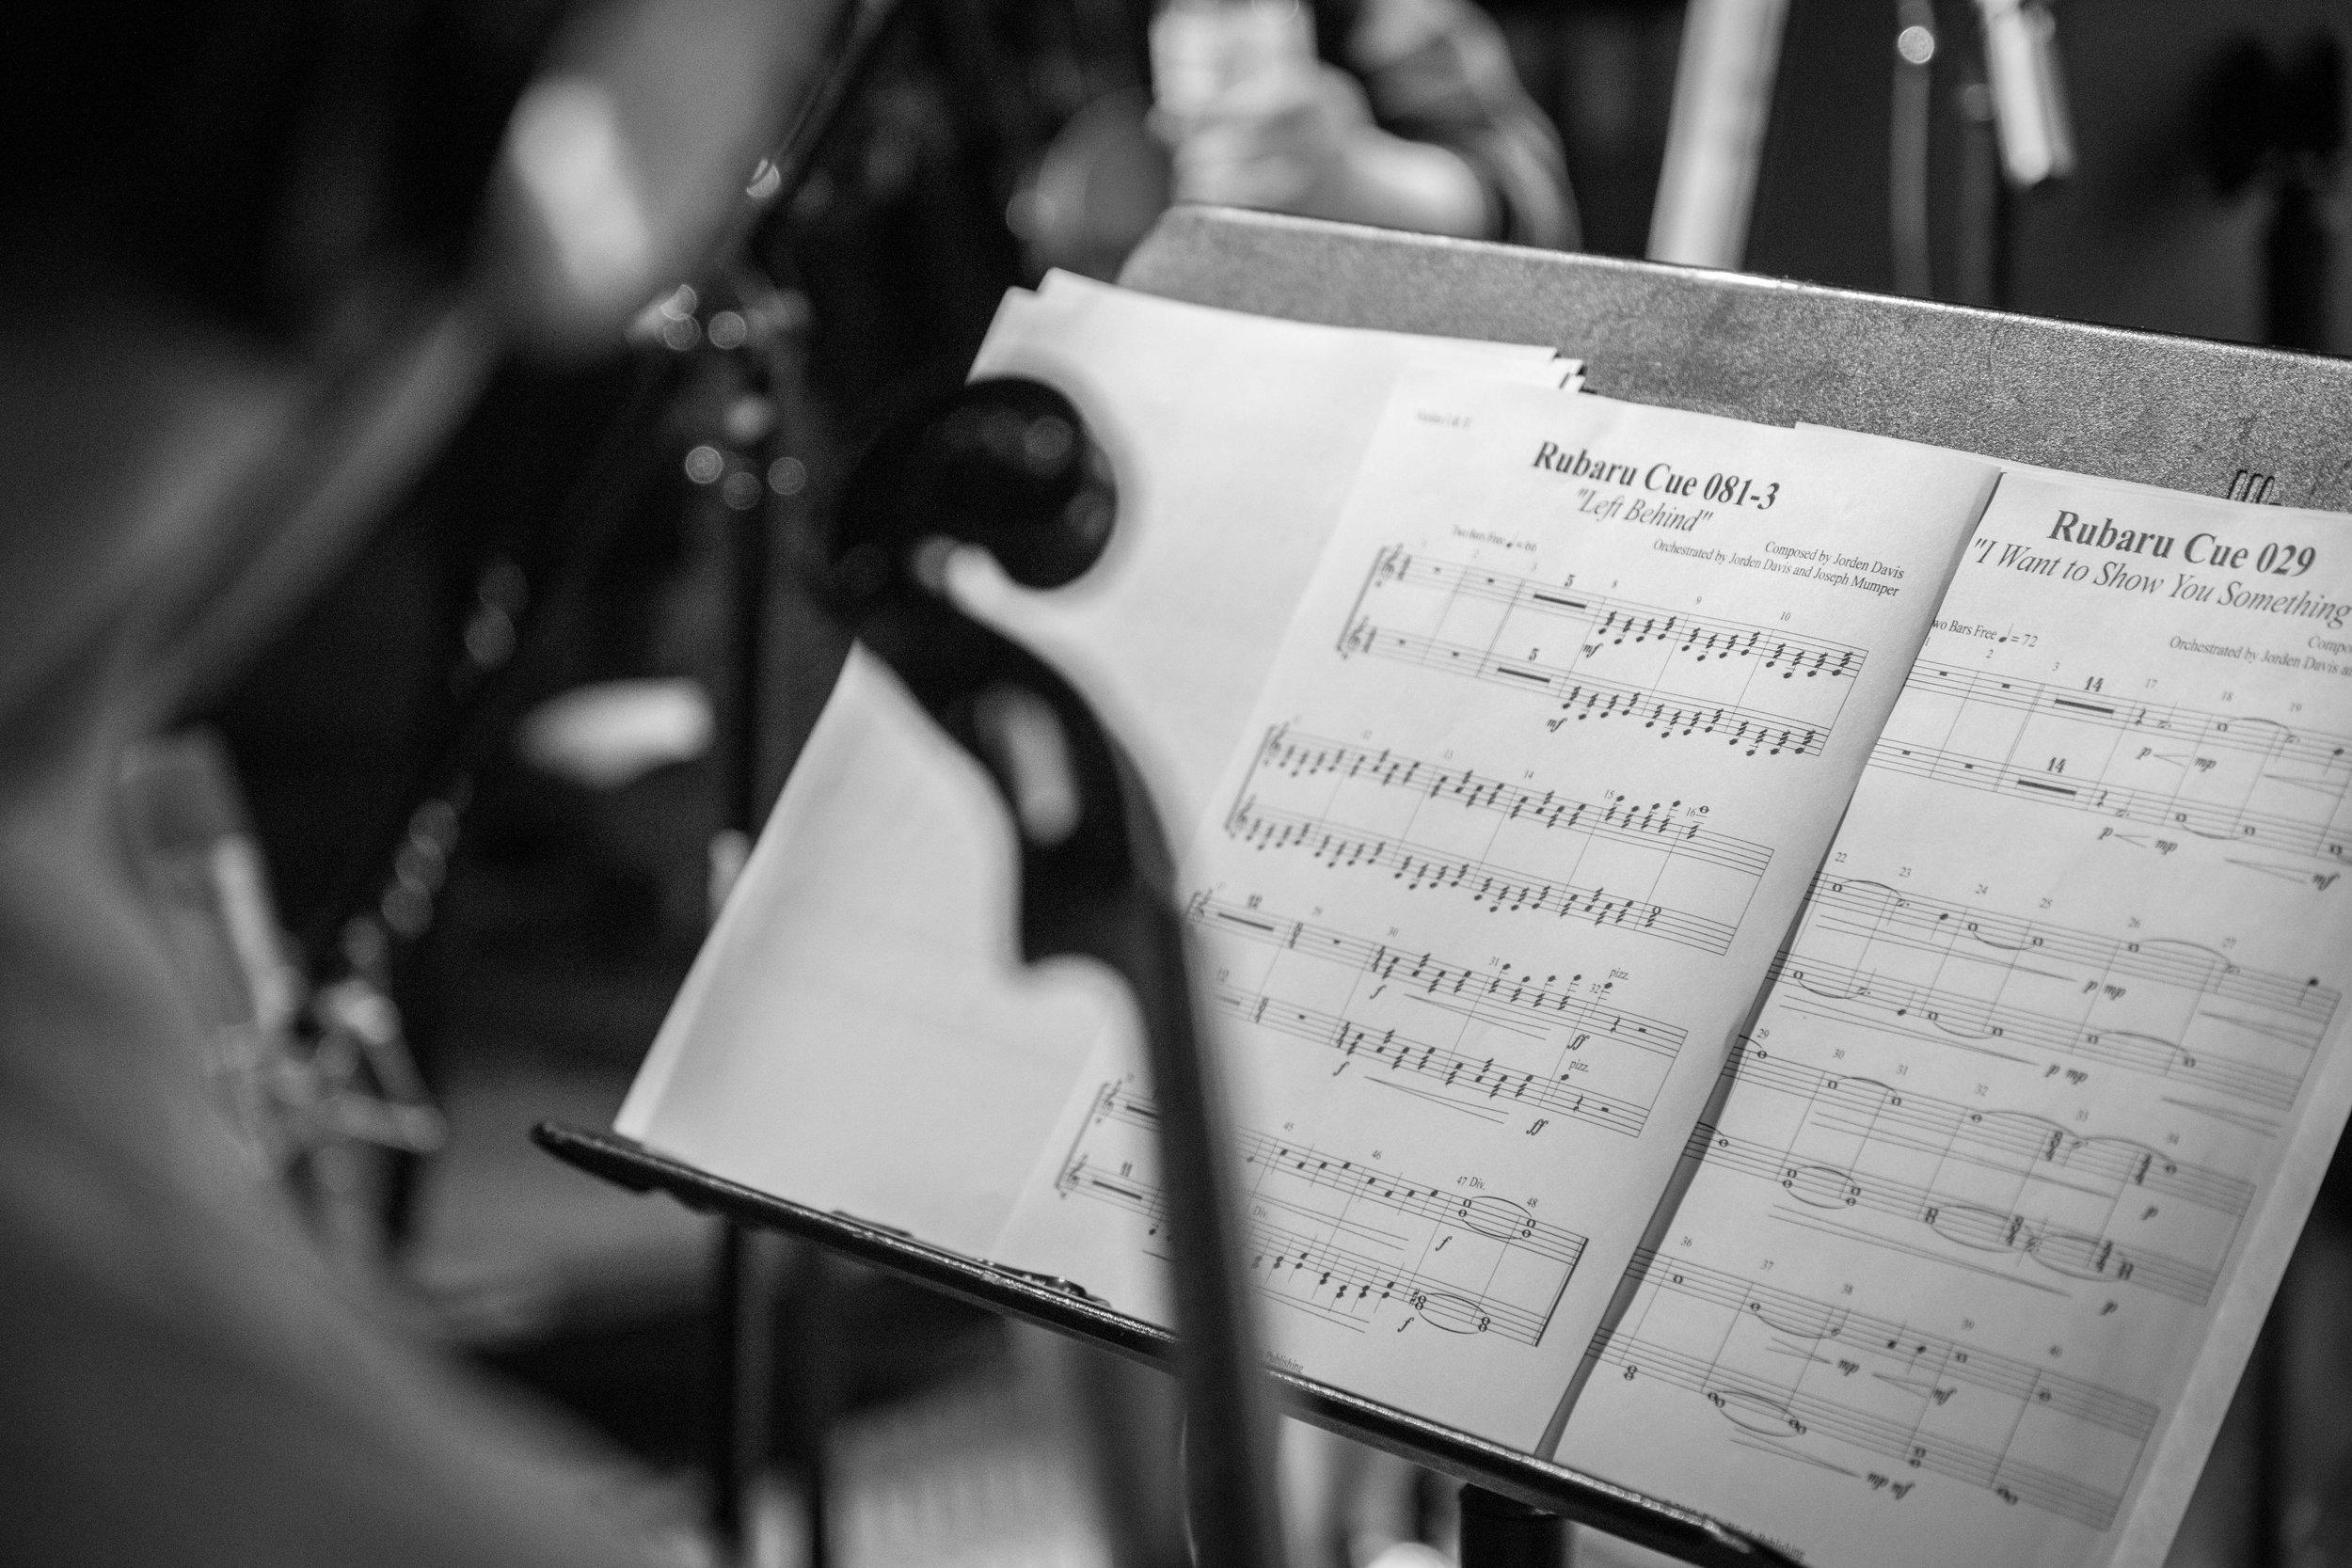 2019_04_24 RUBARU Score Recording-3.jpg